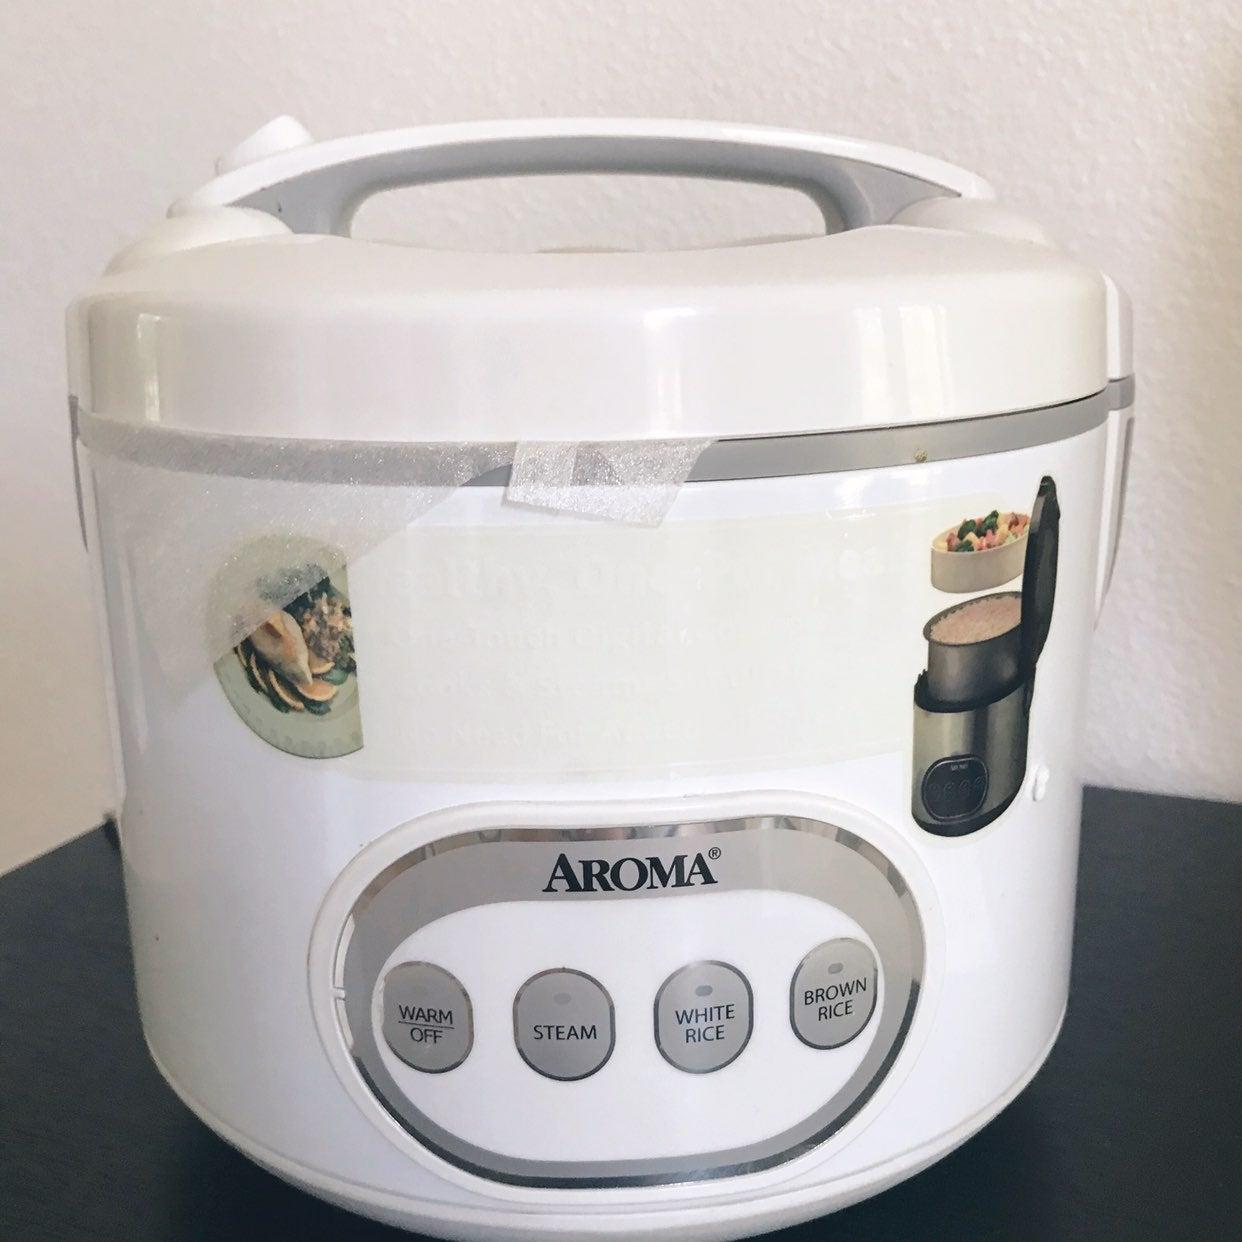 Aroma rice cooker vegie Steamer 16 cups